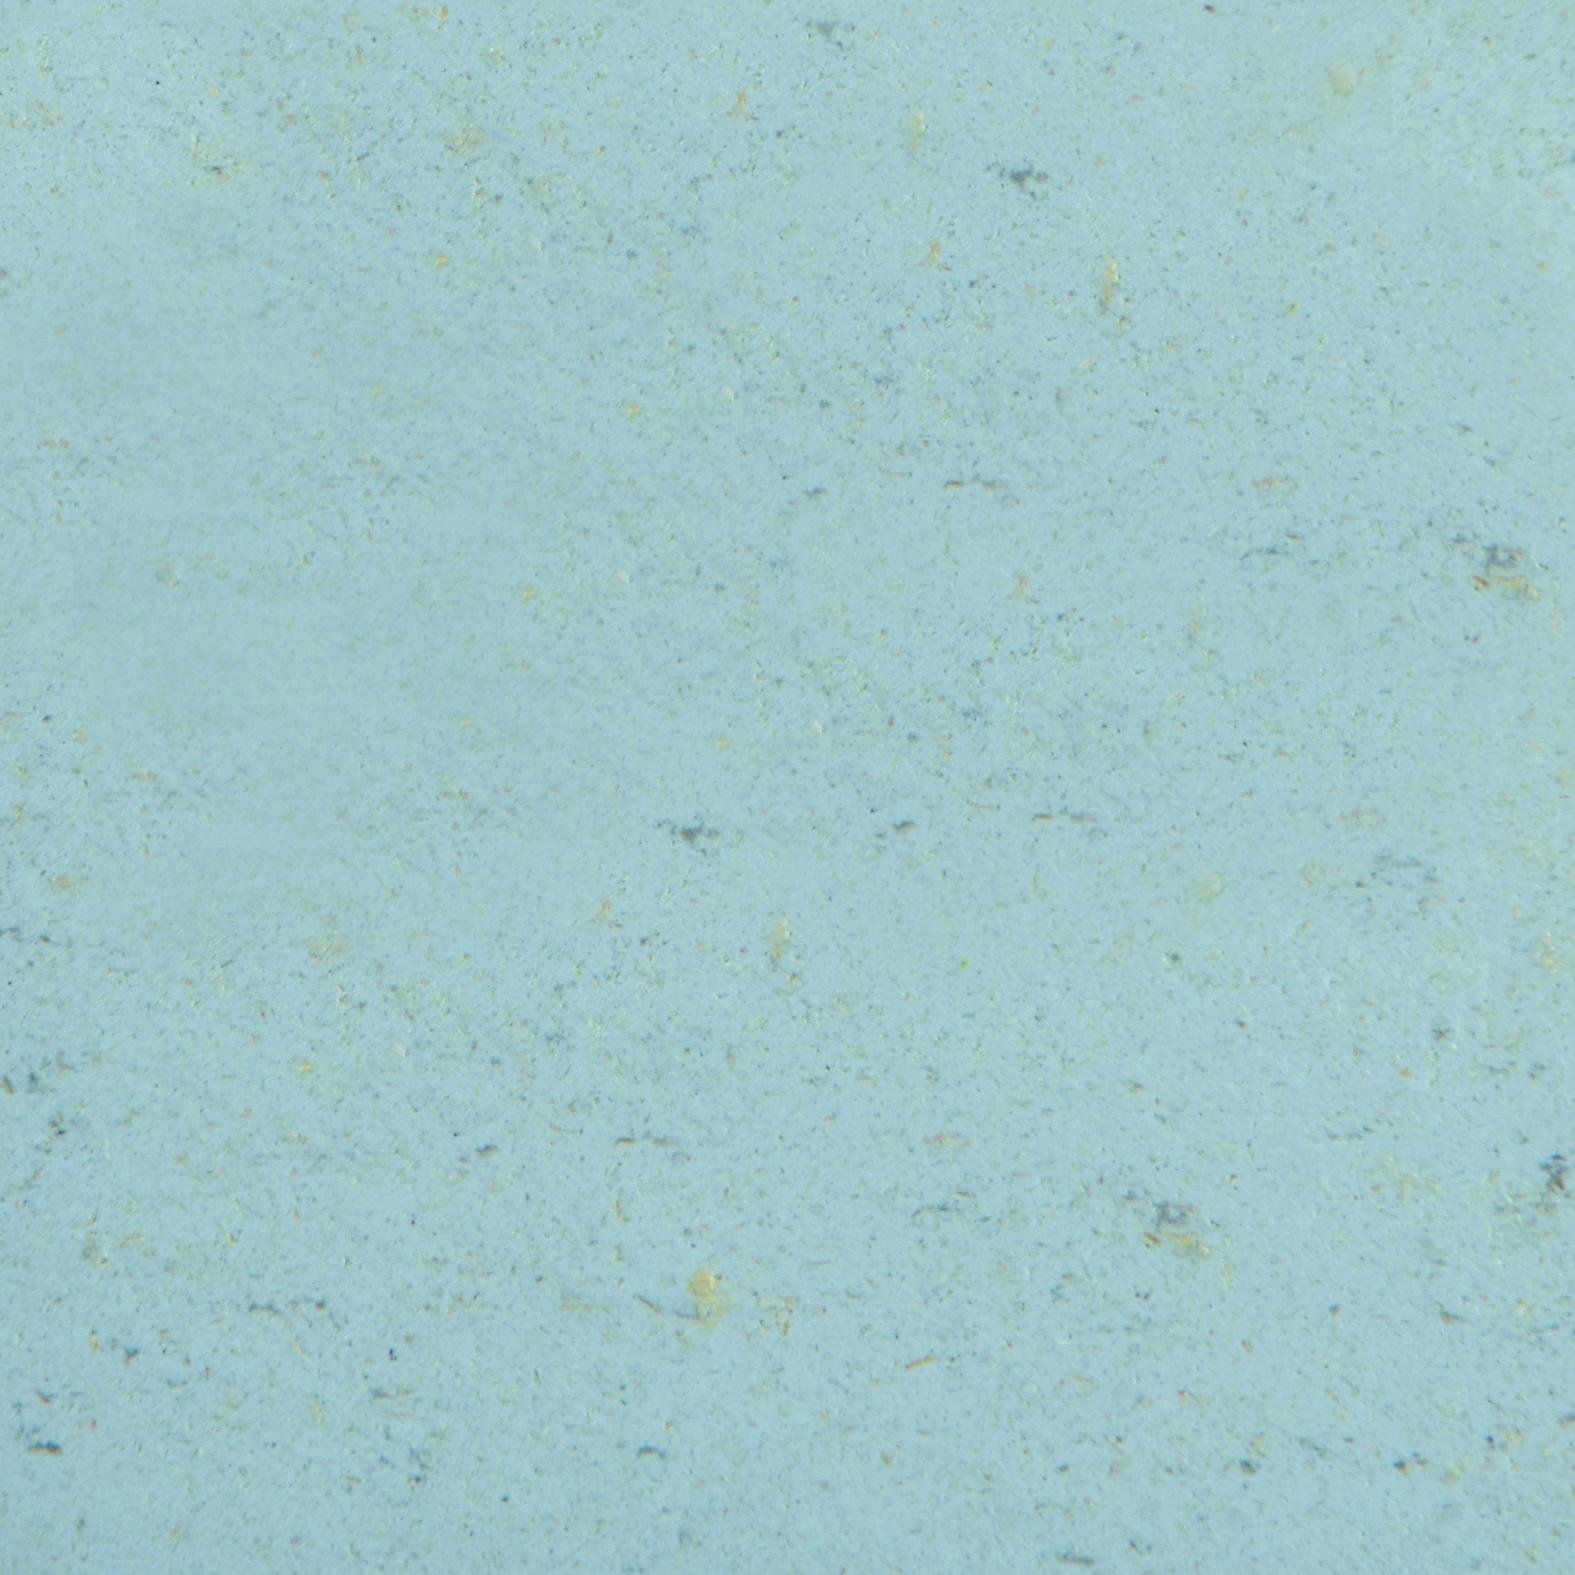 Tabelle-12-Linoleum-felsengrau23tOd34w1rz48